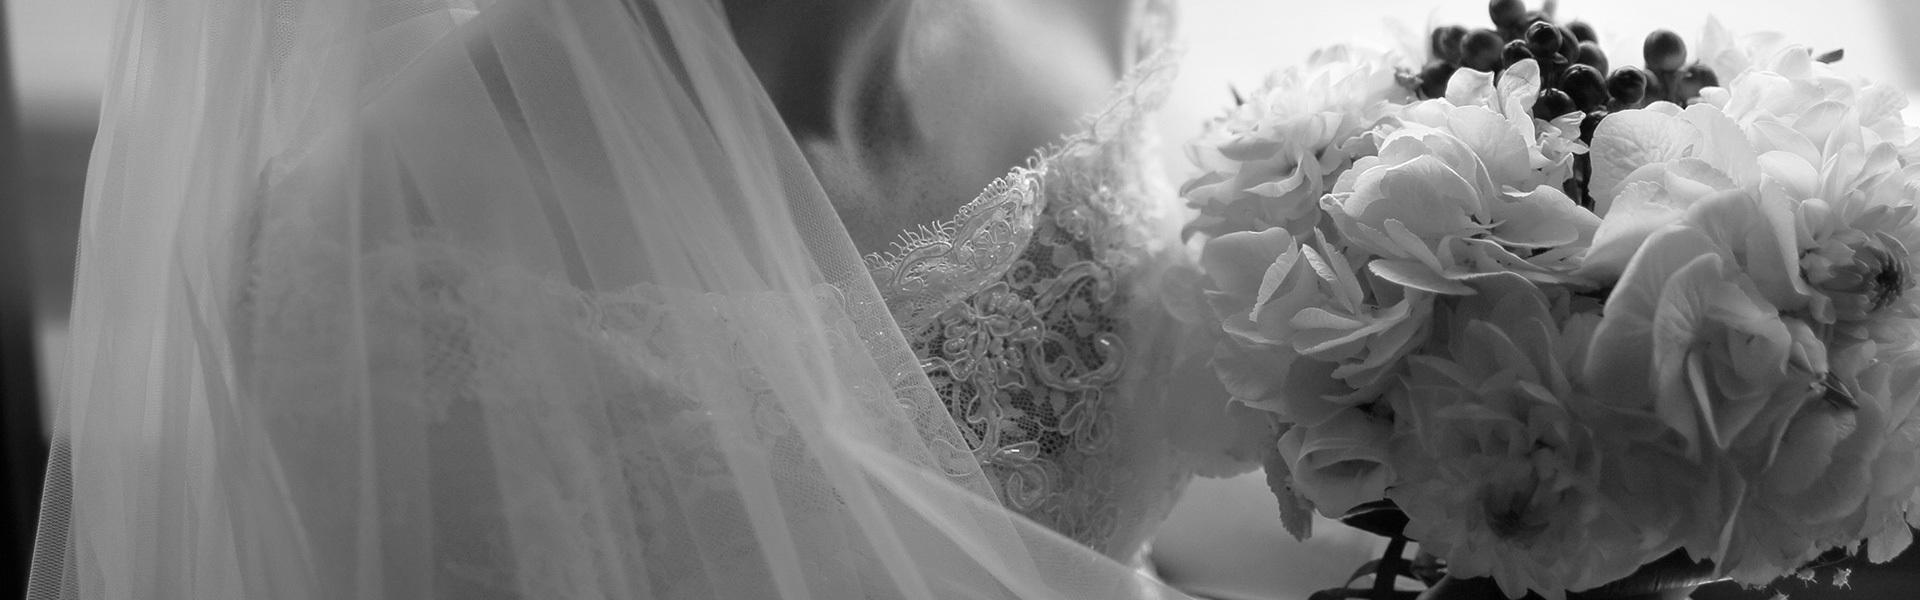 Wedding Dresses Berkshire, Designer Wedding Dress Outlet, Wedding Dresses Bucks